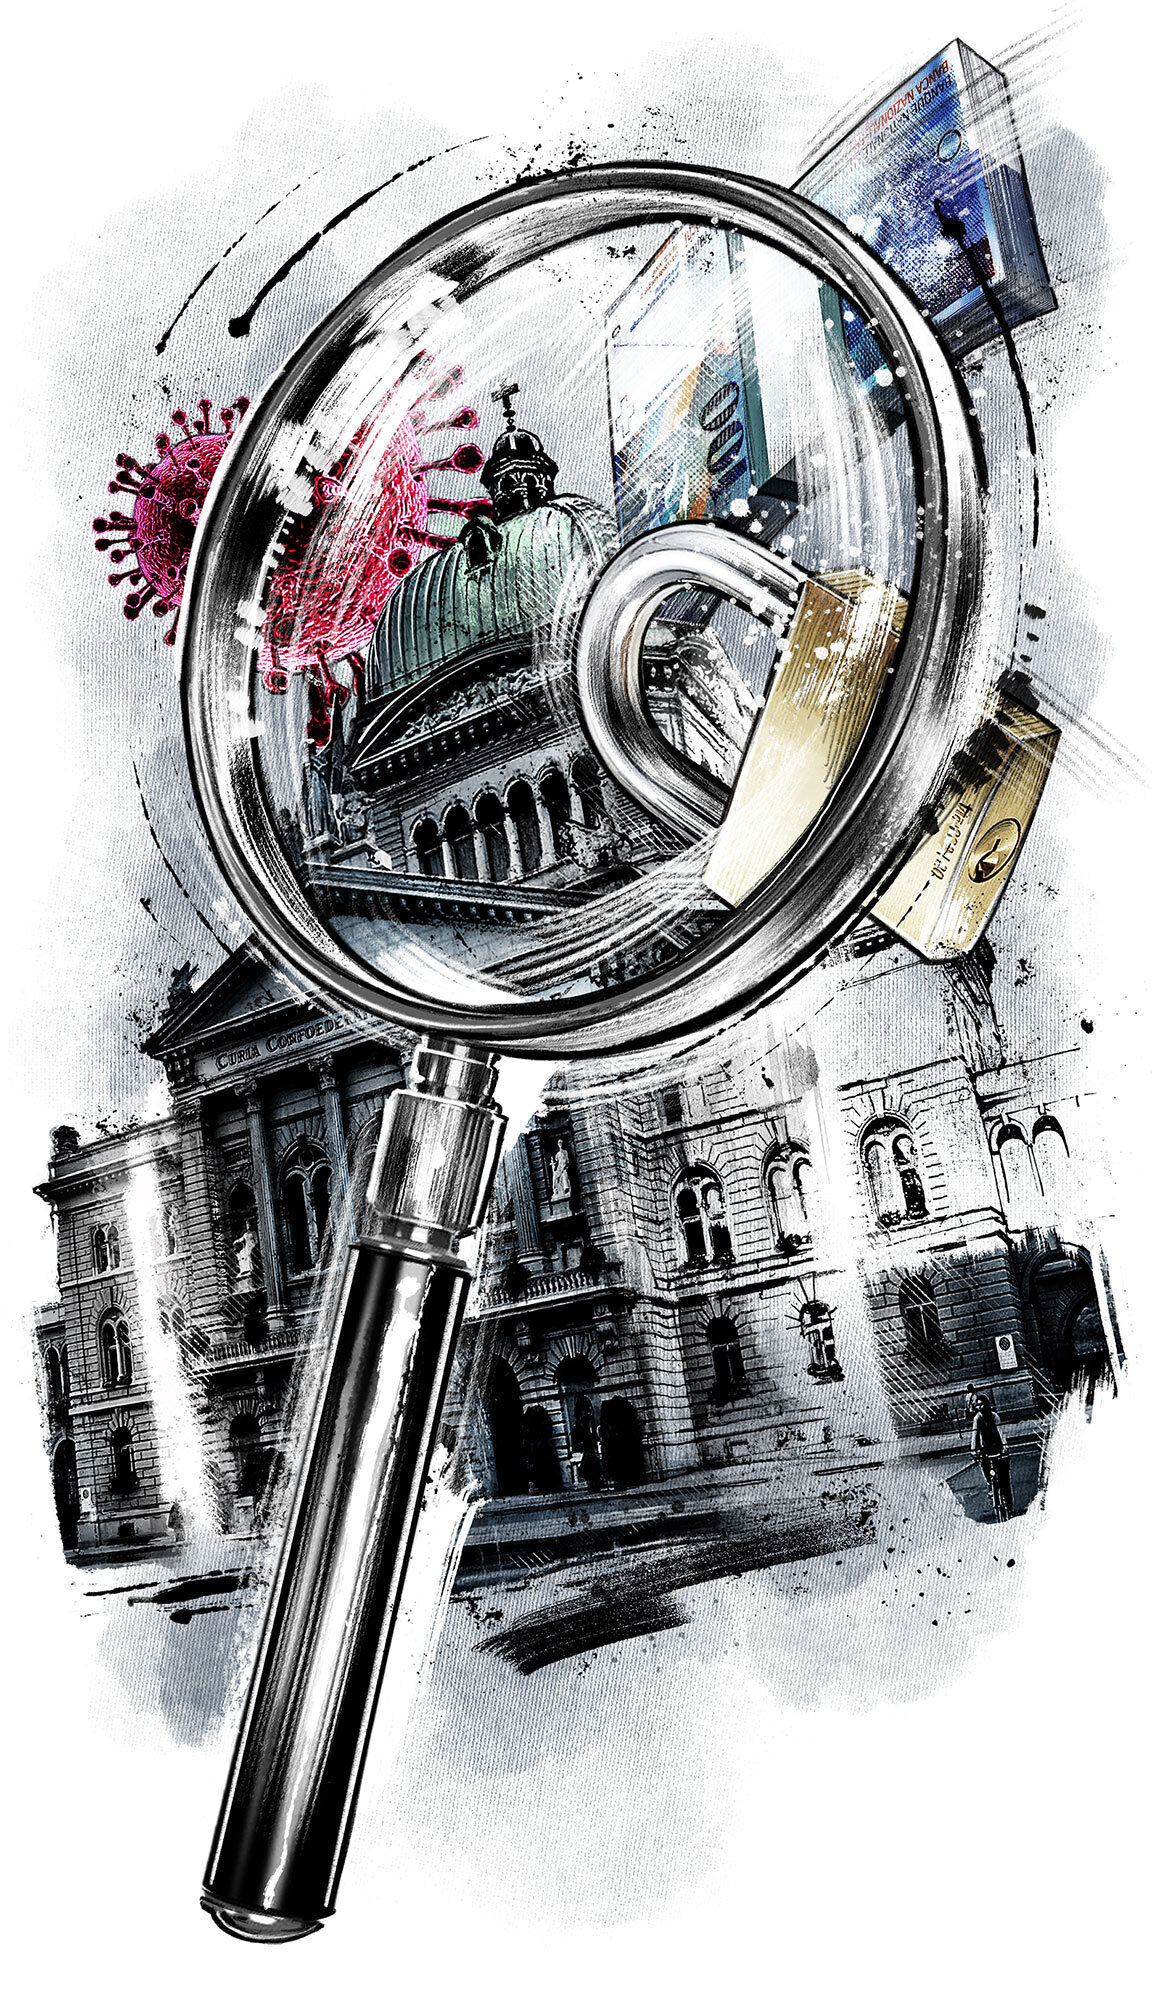 Editorial illustration bundeshaus bilanz politik corona schweiz - Kornel Illustration | Kornel Stadler portfolio